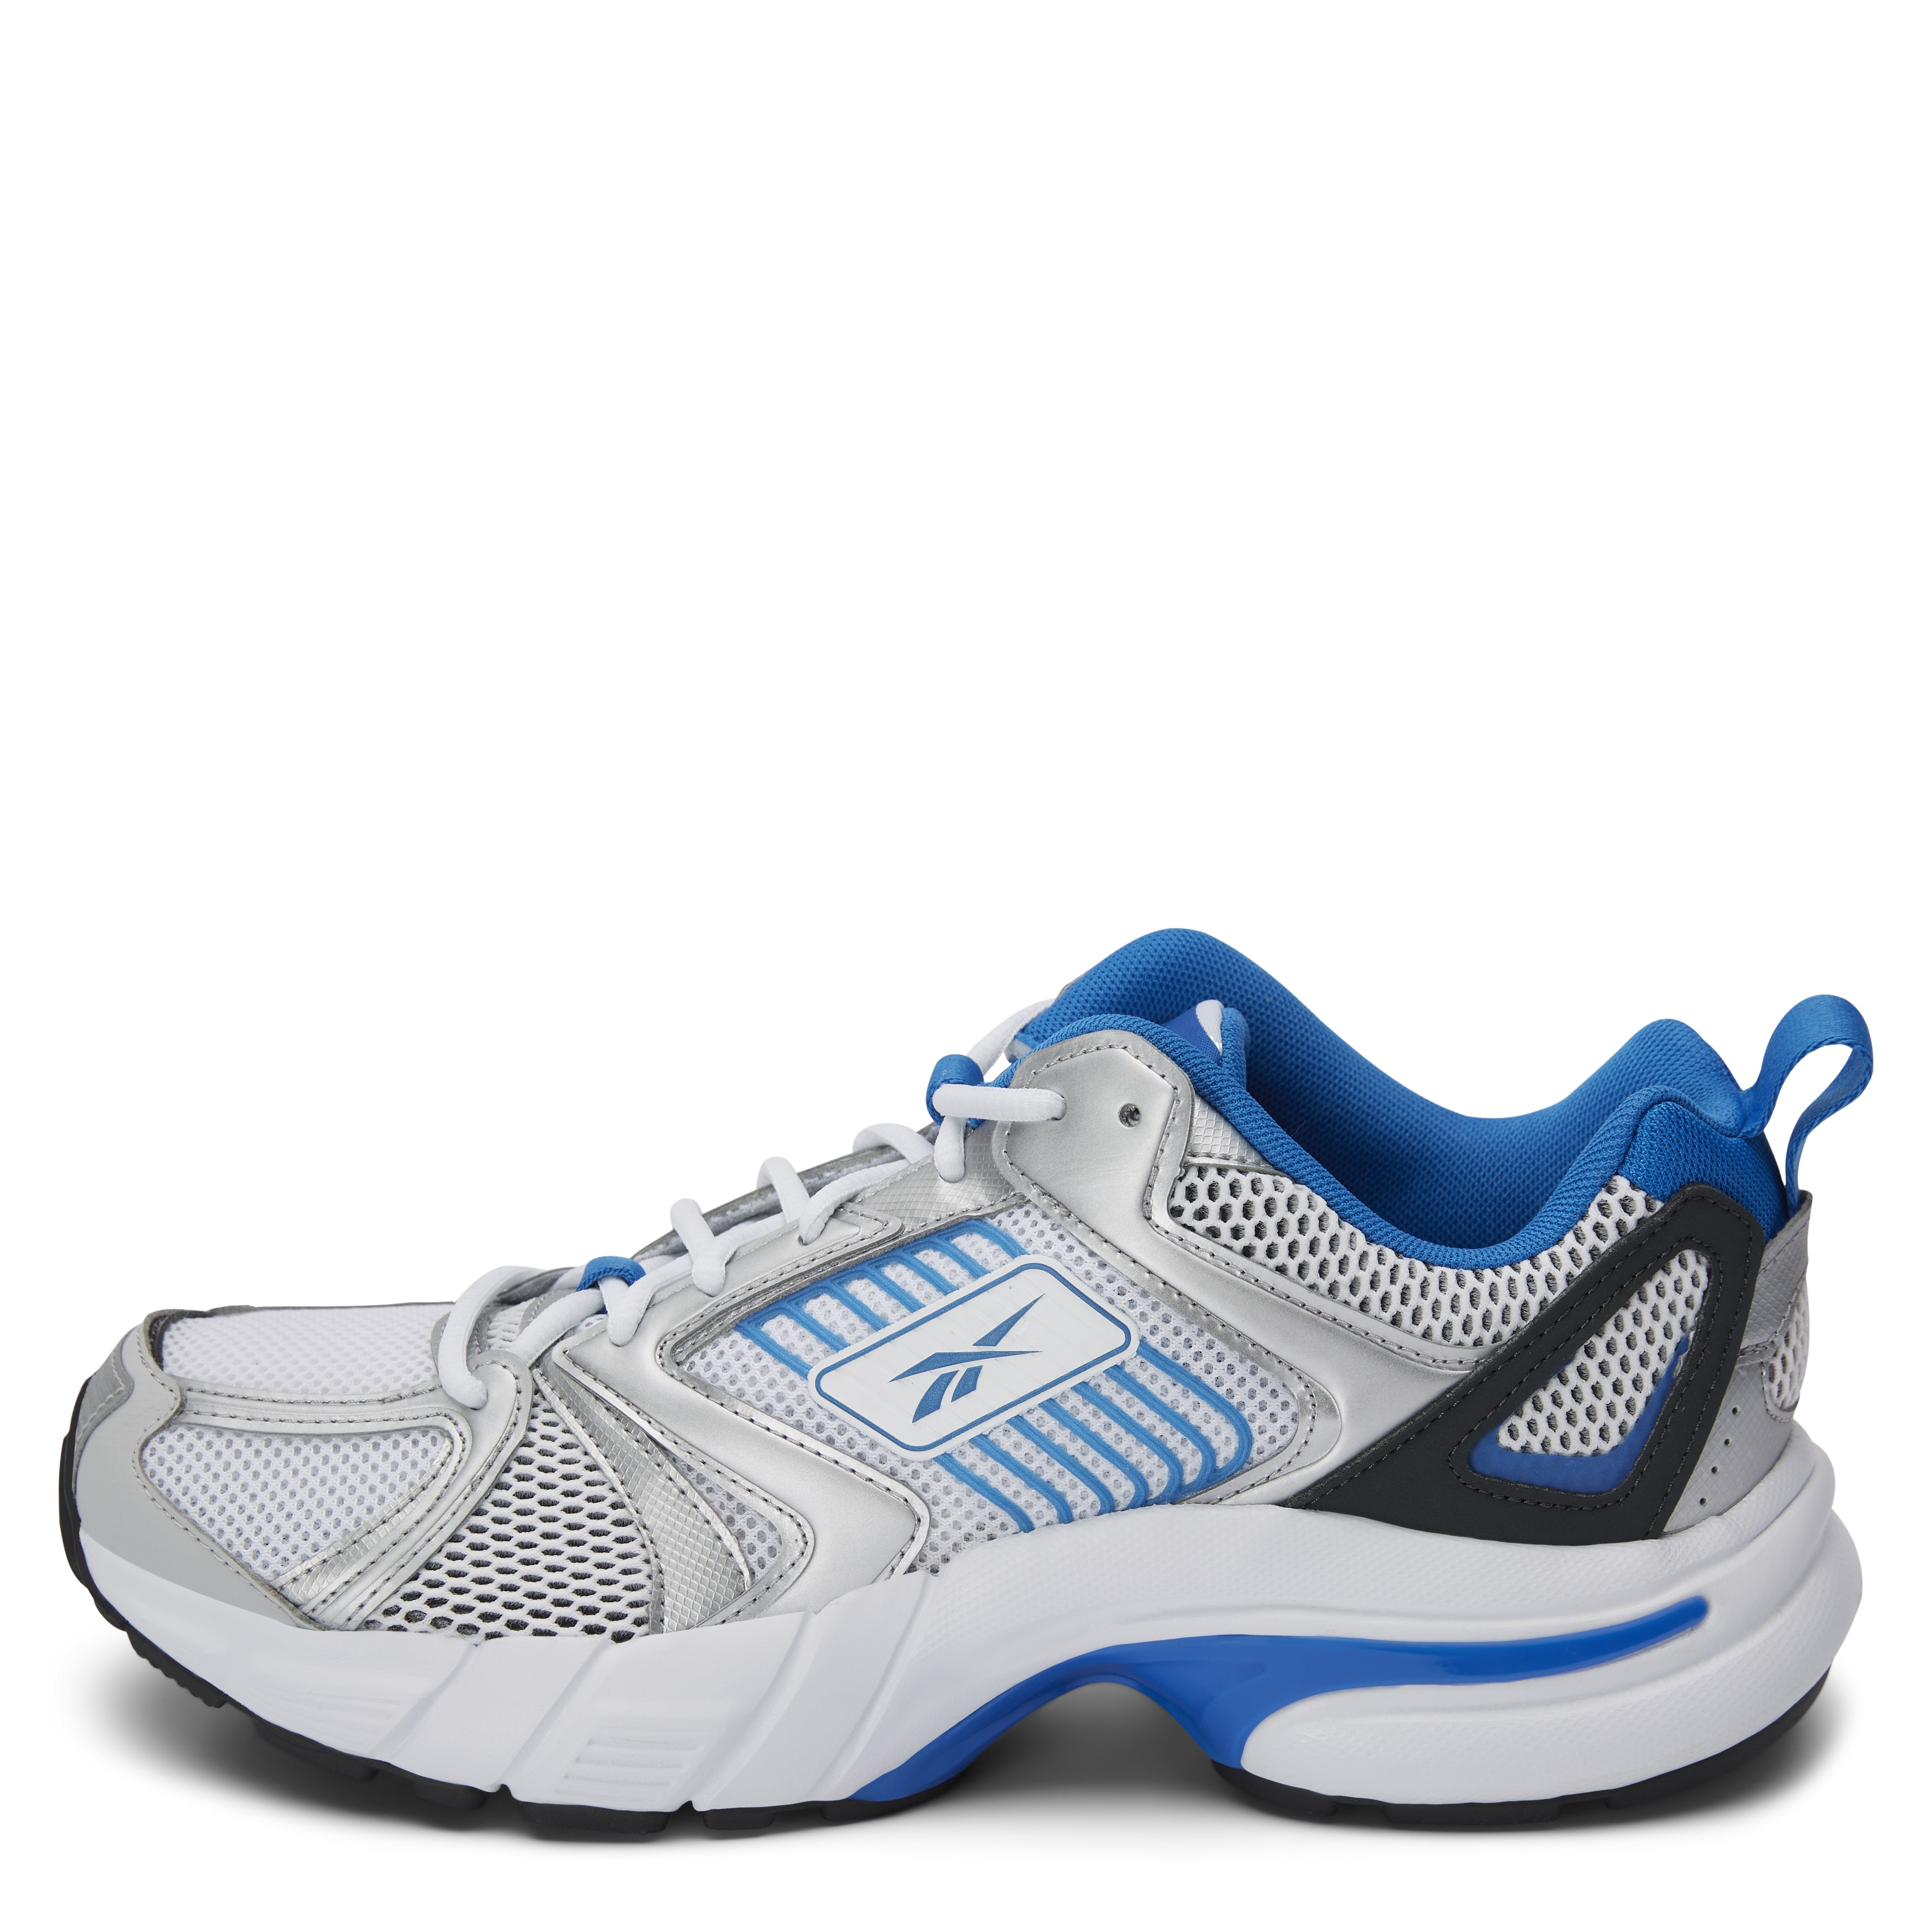 RBK Premier Sneaker - Shoes - Blue